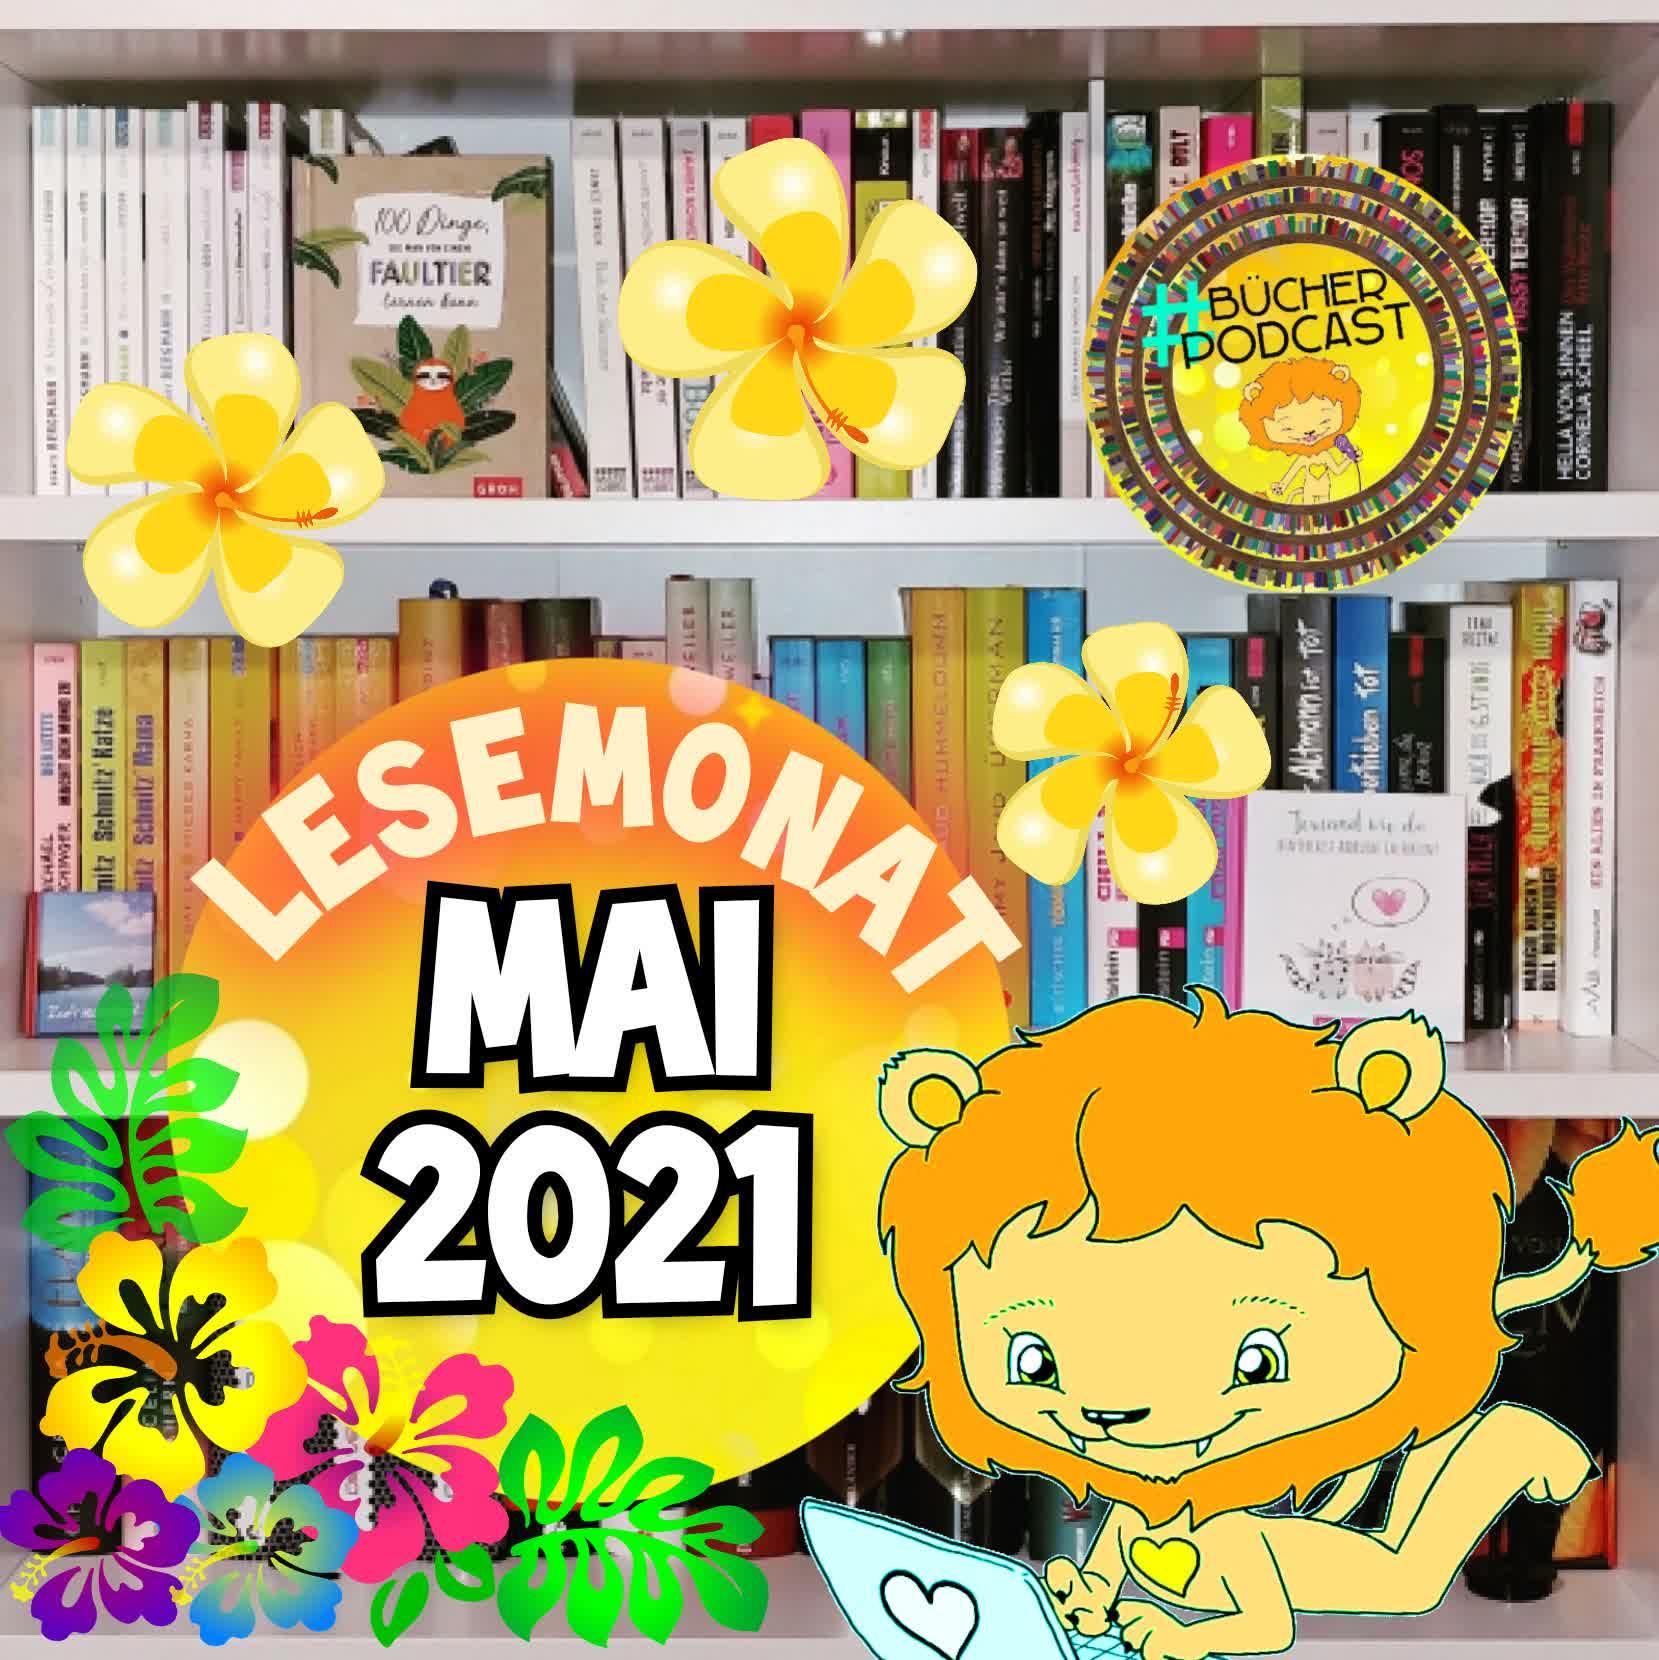 Lesemonat Mai 2021